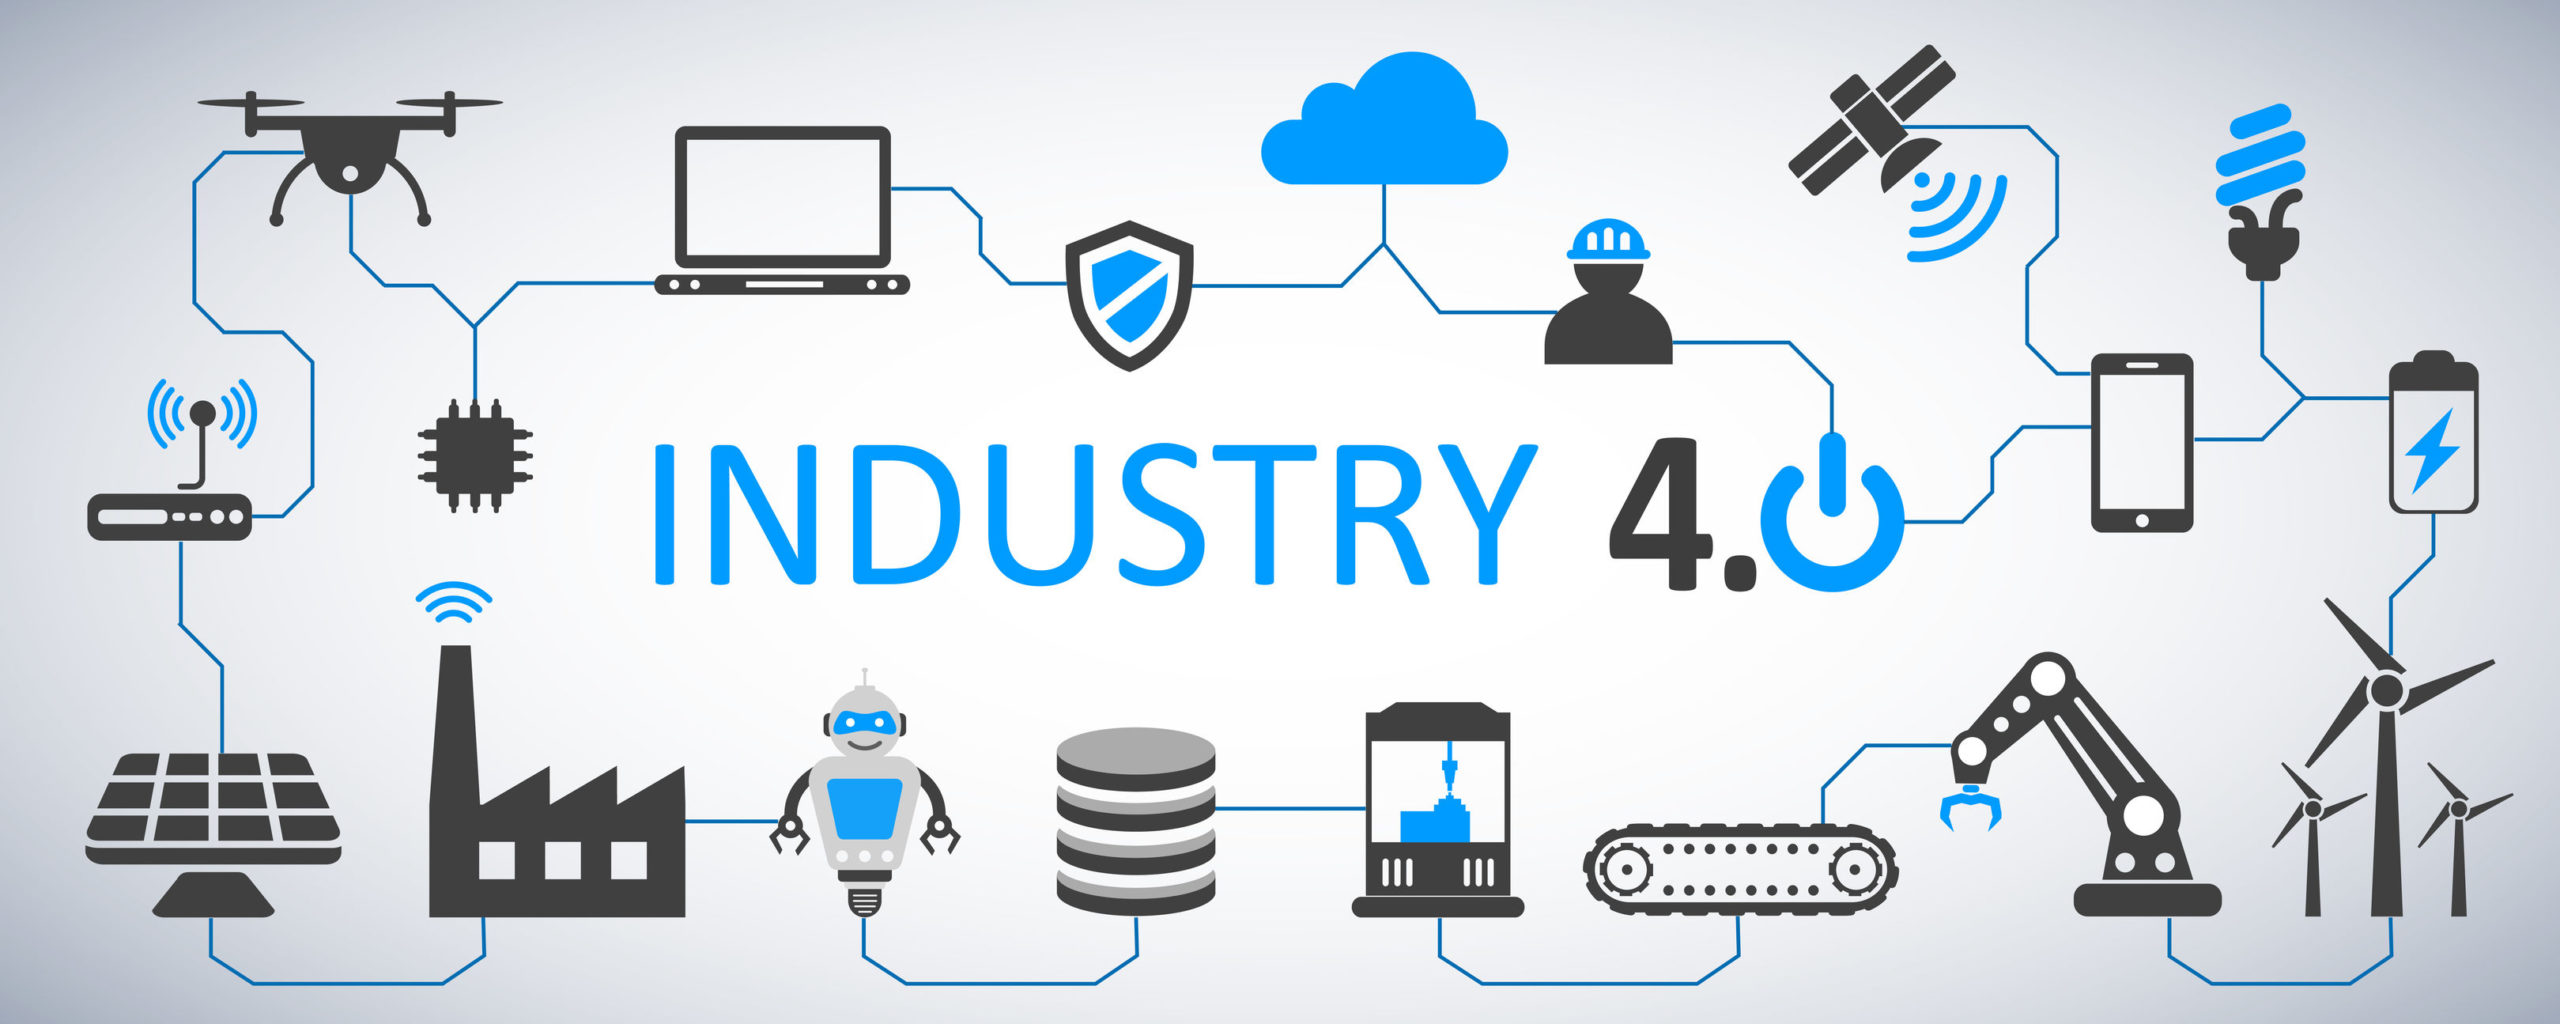 Цифровая революция производства